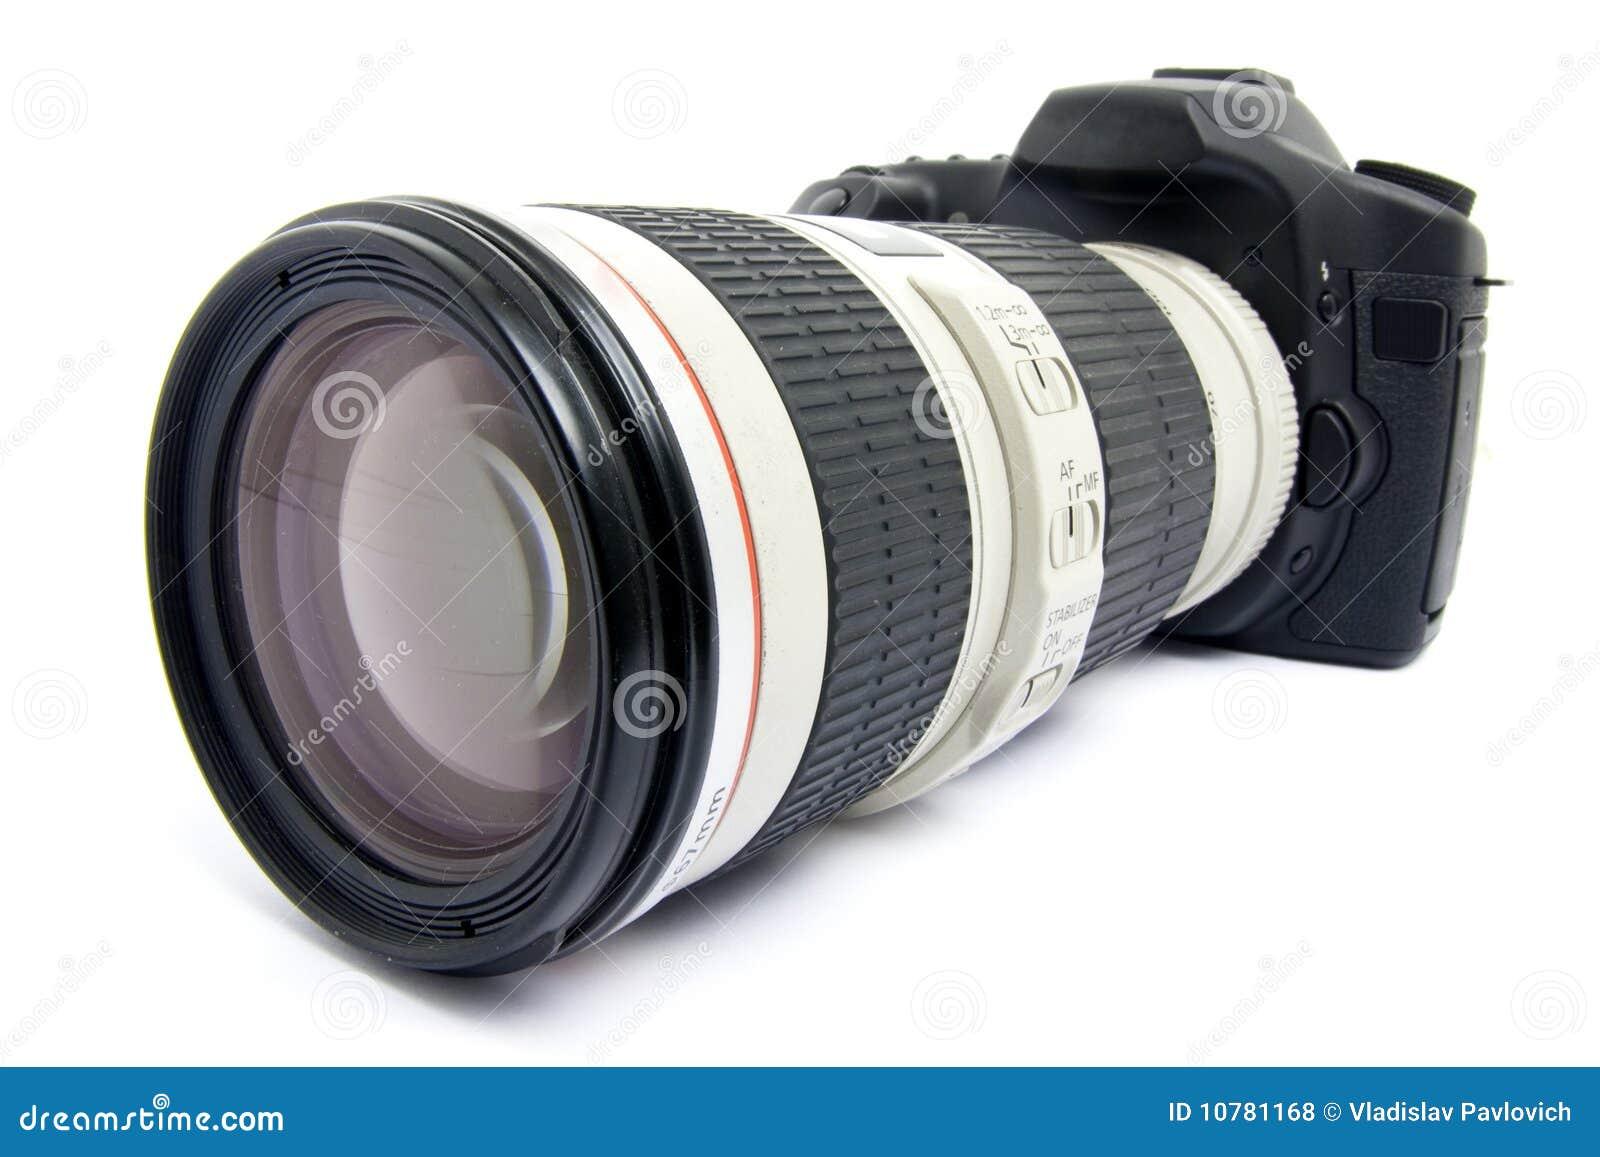 Camera DSLR met zoomlens.